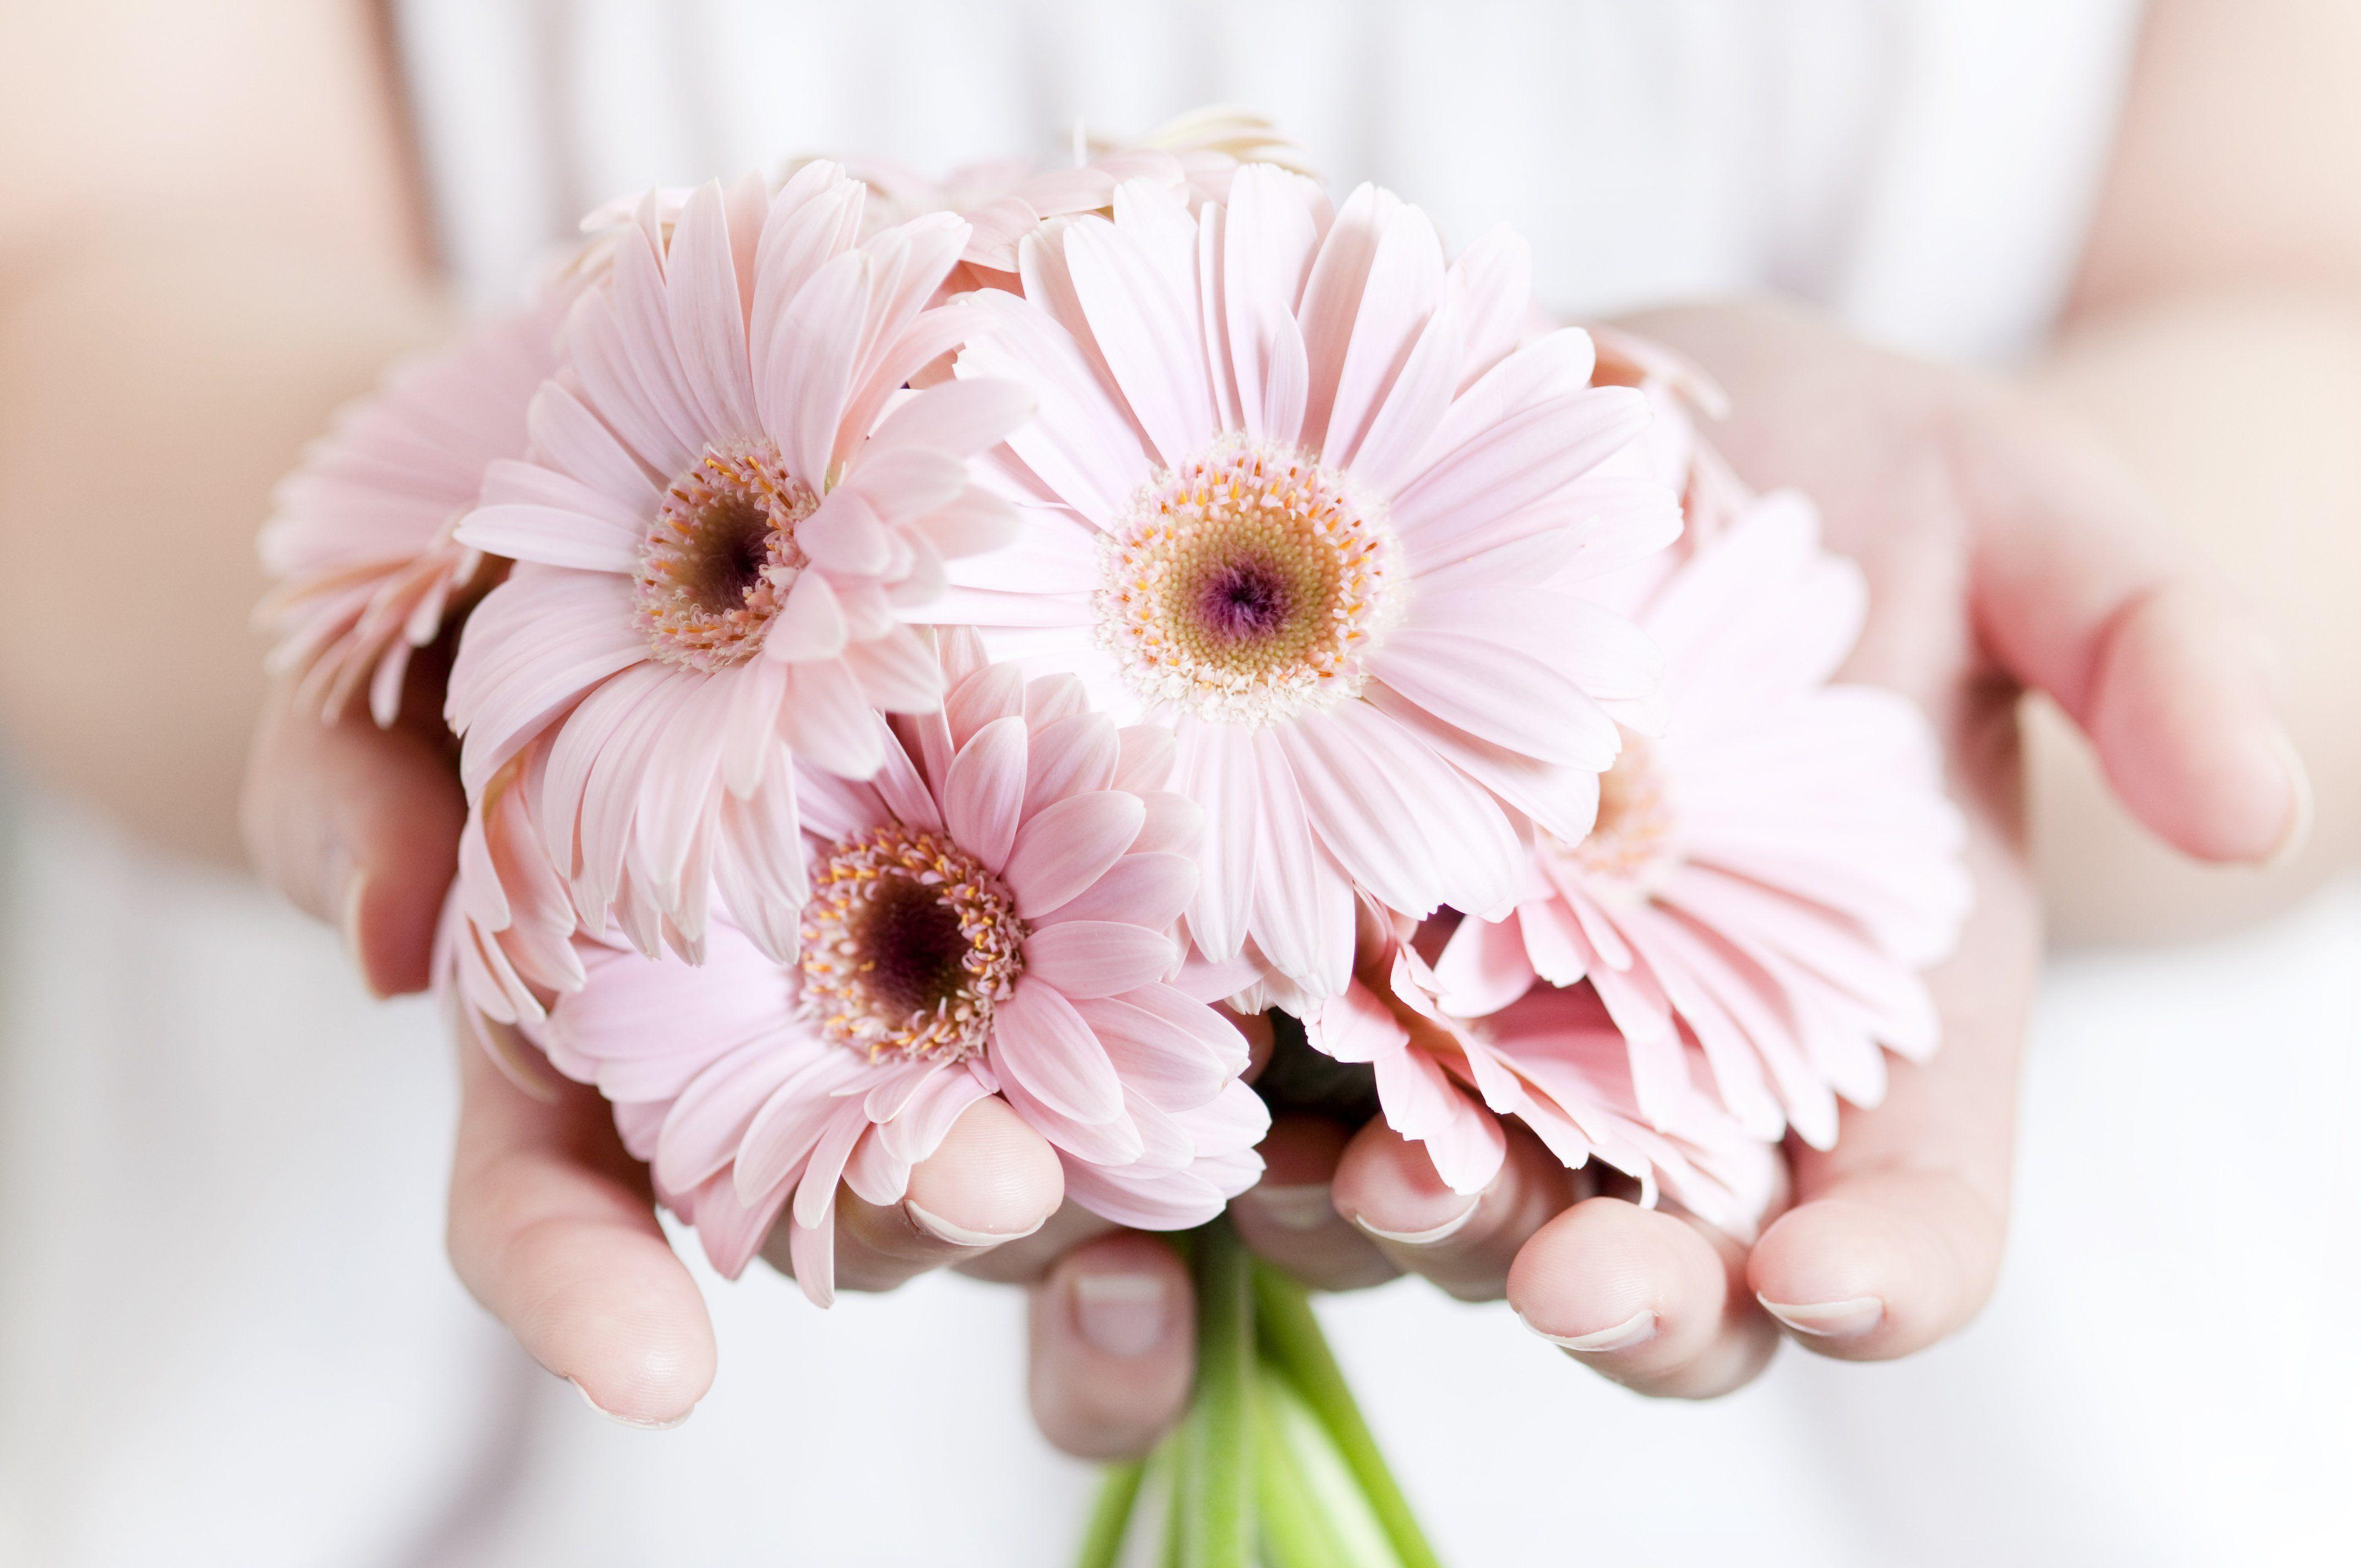 Download Hd Wallpapers Of Pink Flower Wallpaper Tumblr Hands High